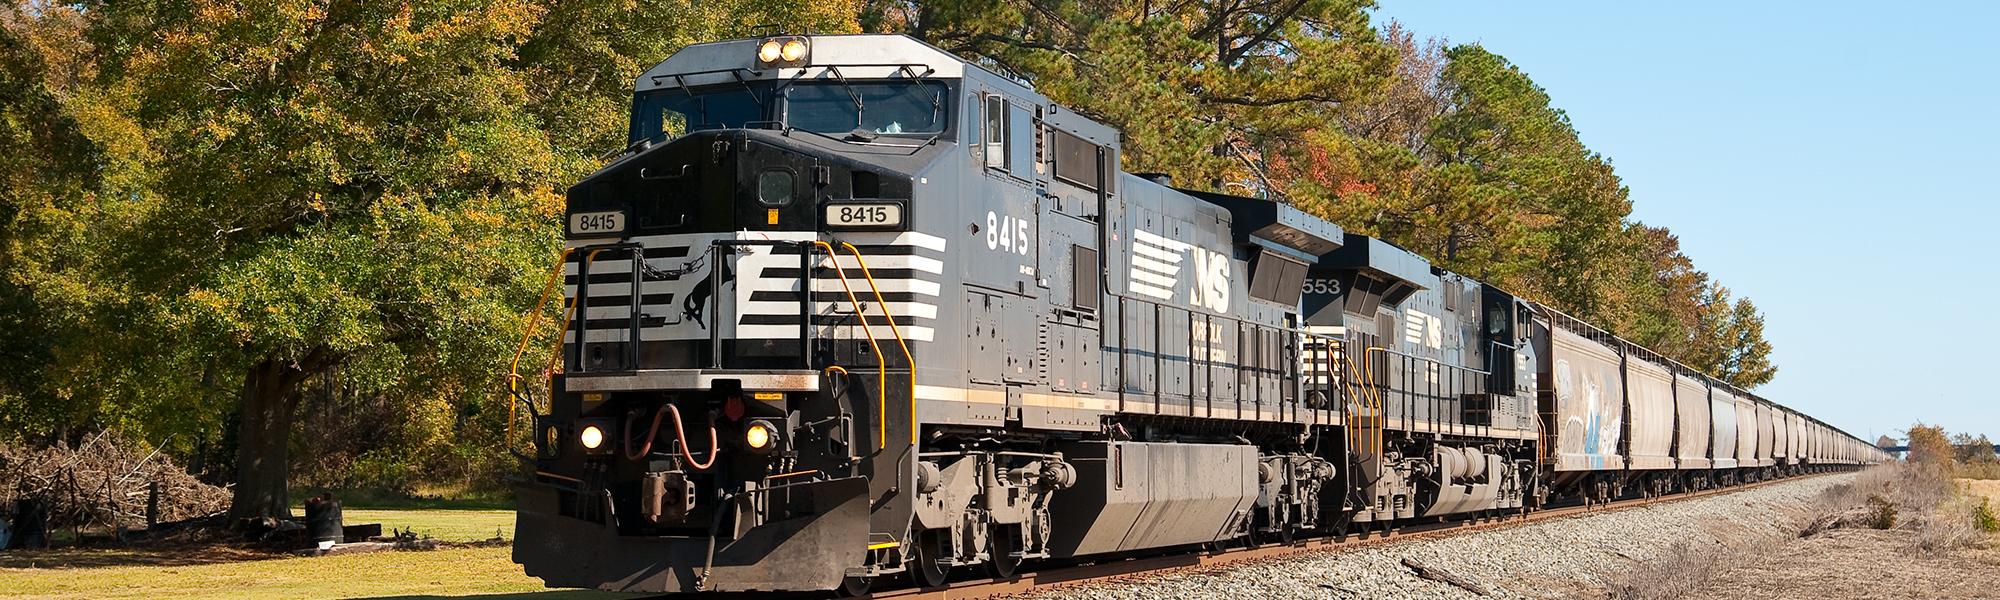 Safety | North Carolina Railroad